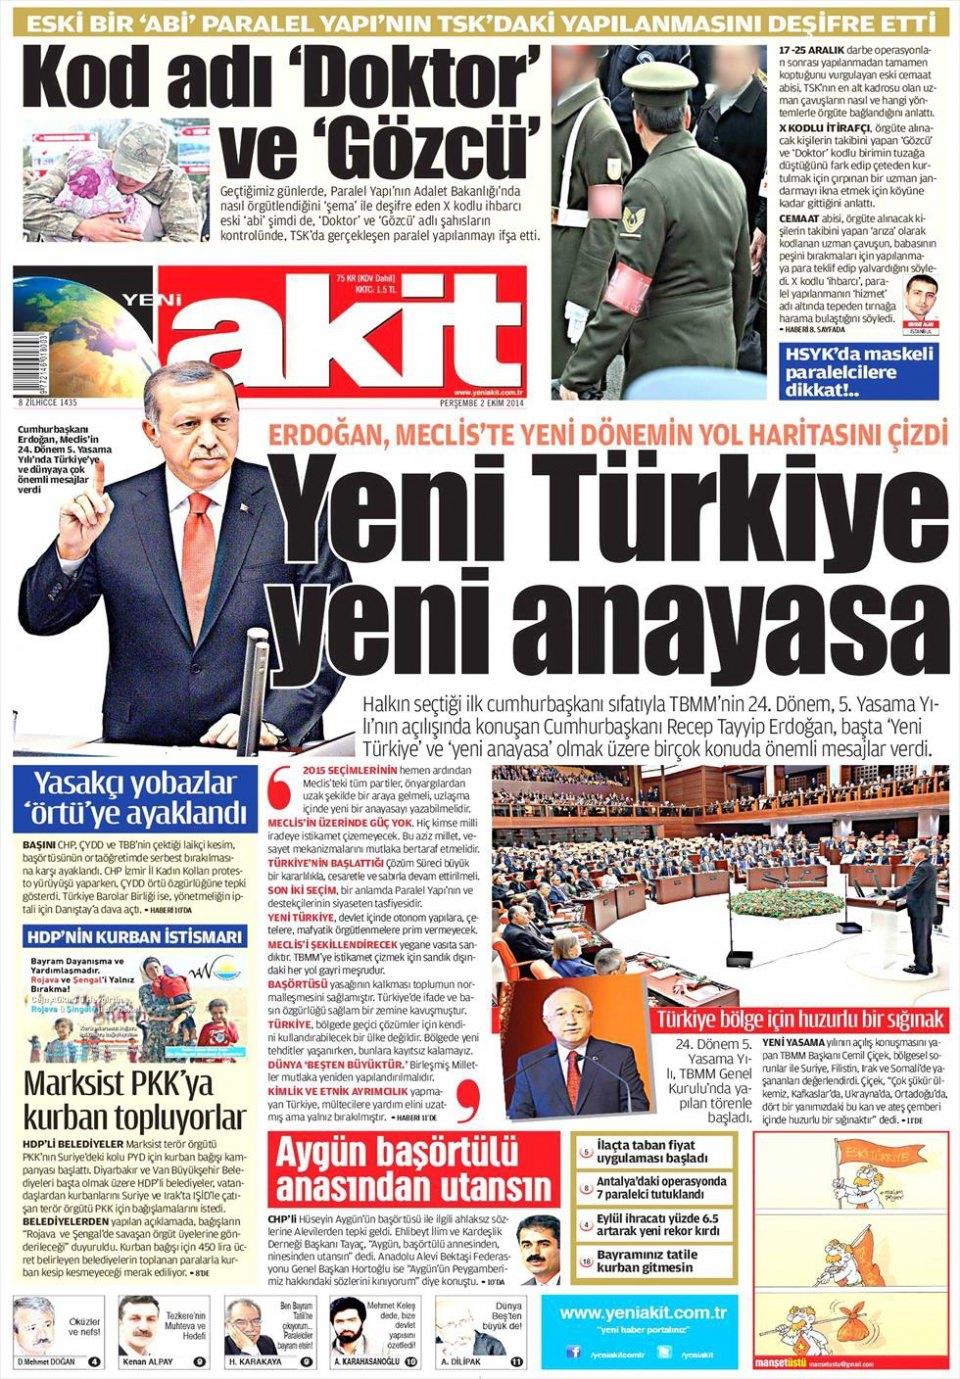 2 Ekim 2014 gazete manşetleri 23